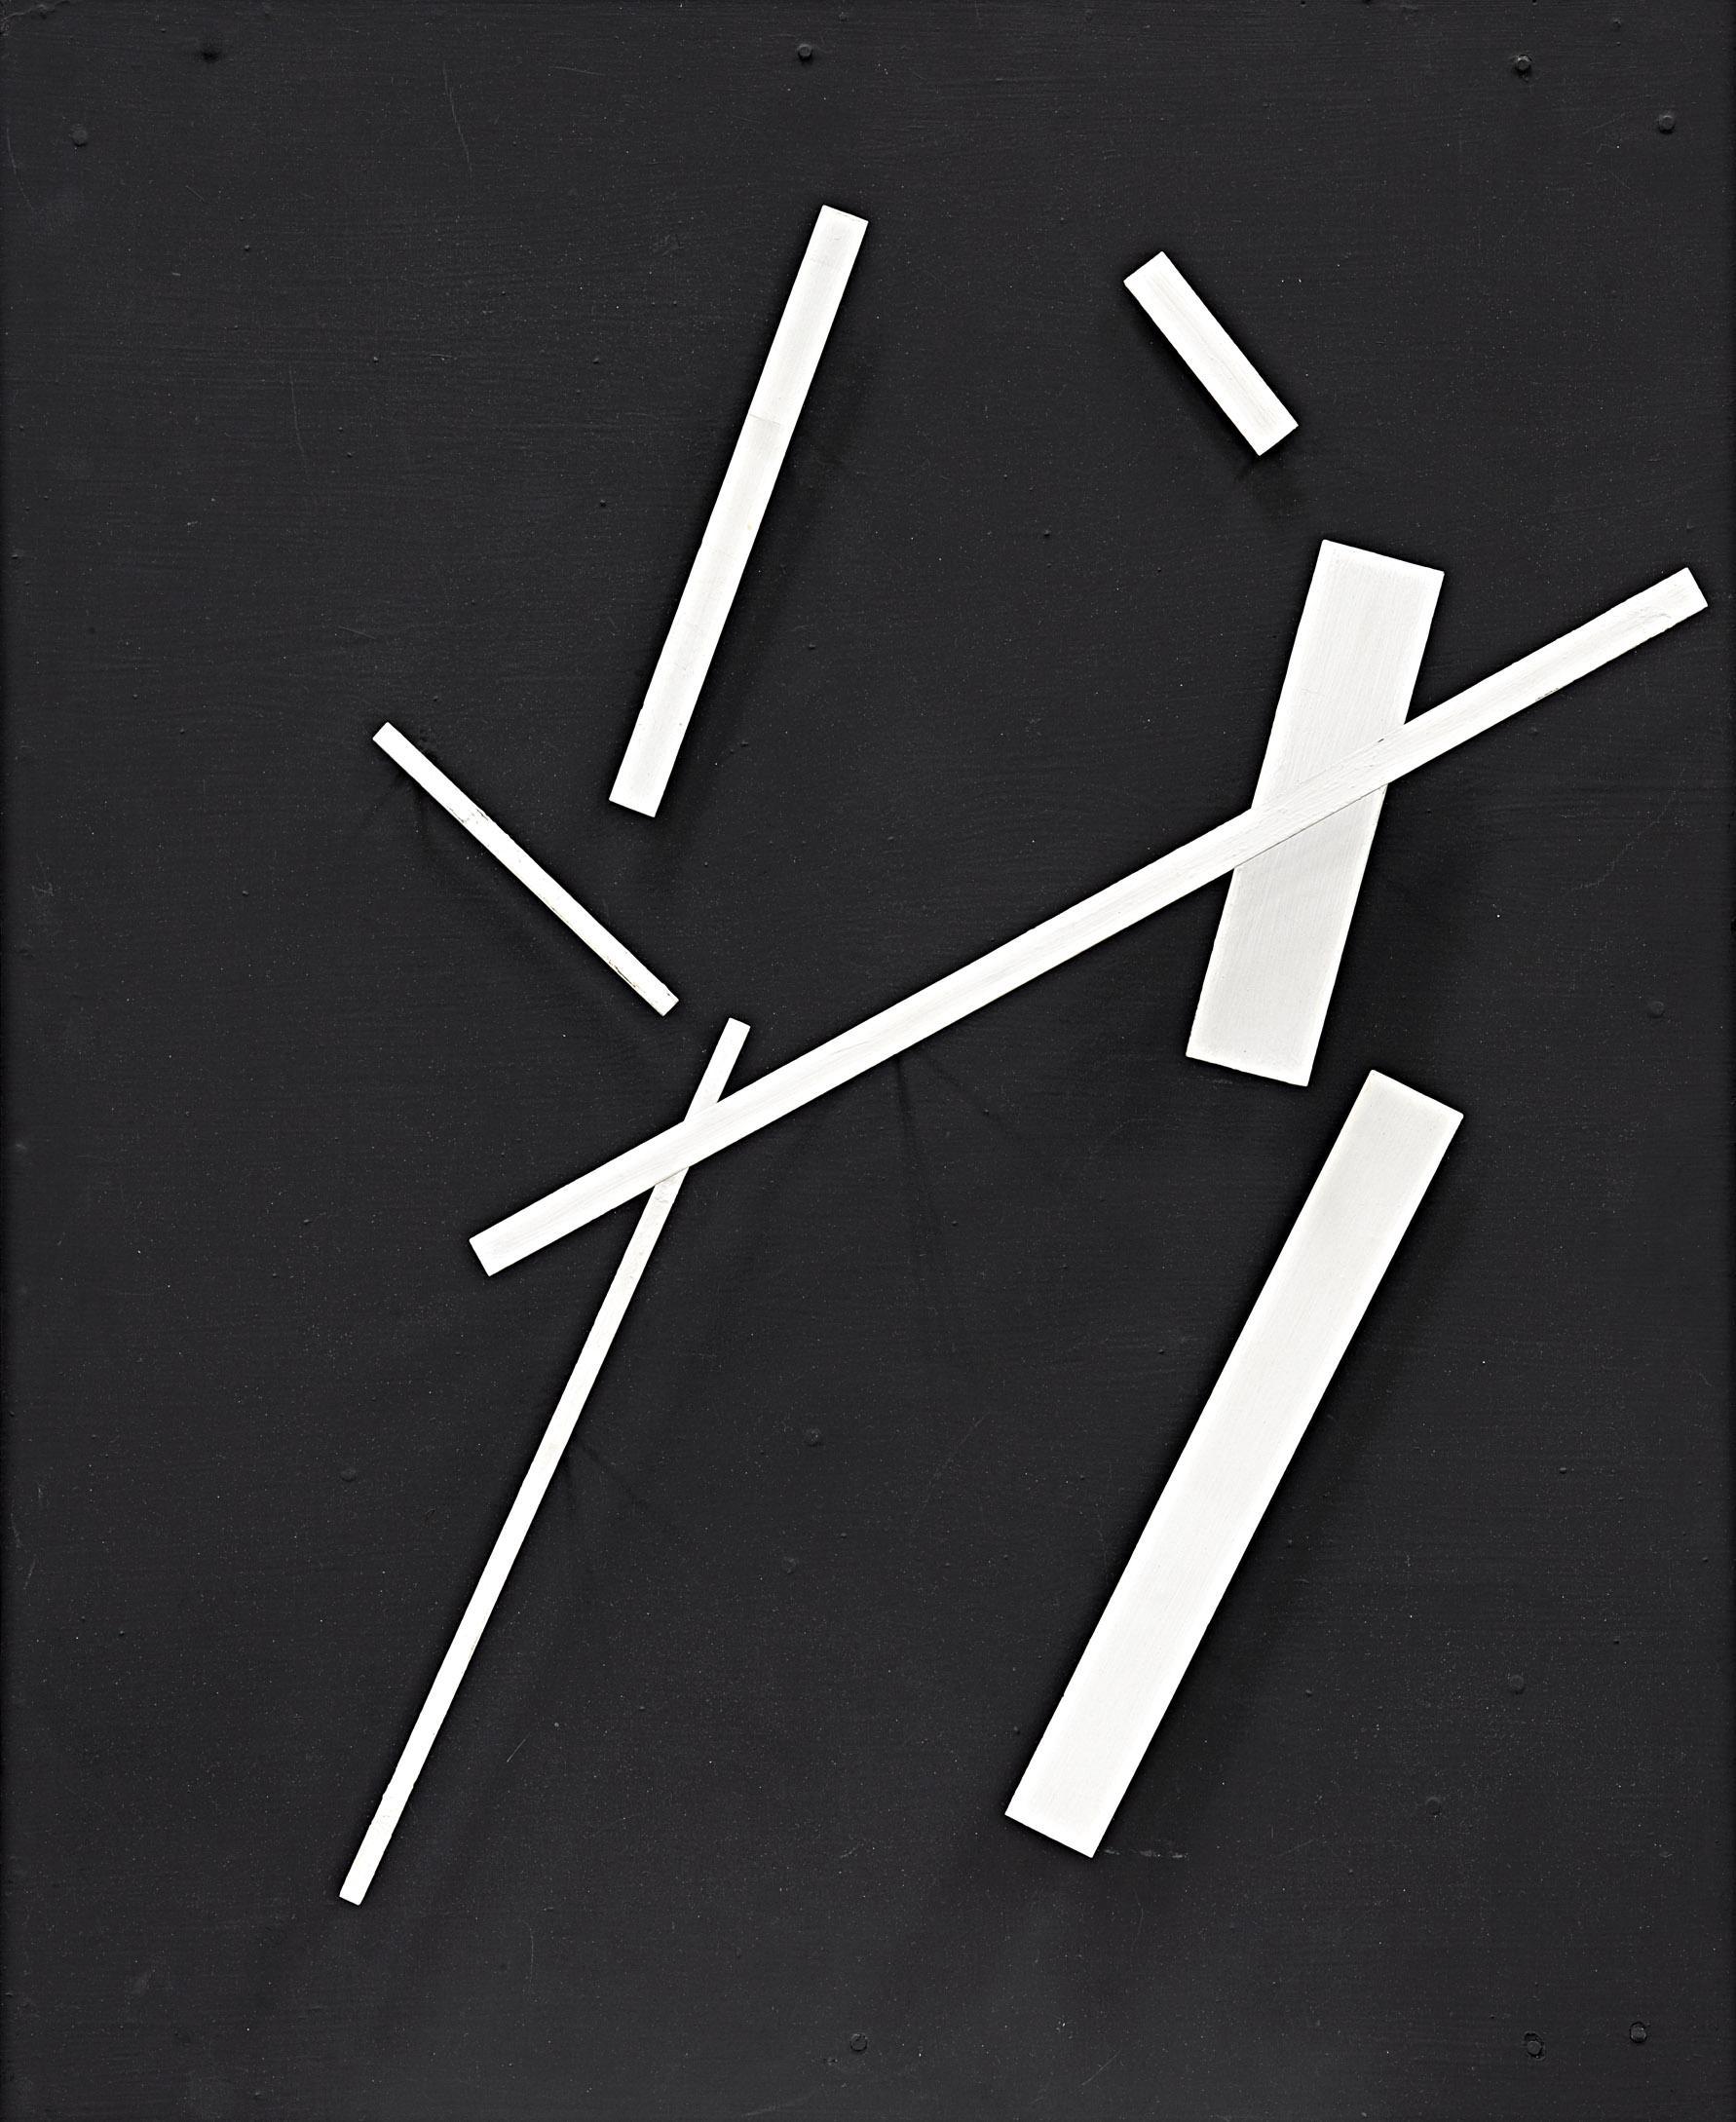 Jean Tinguely M 233 Ta Mal 233 Vich Meta Malevich